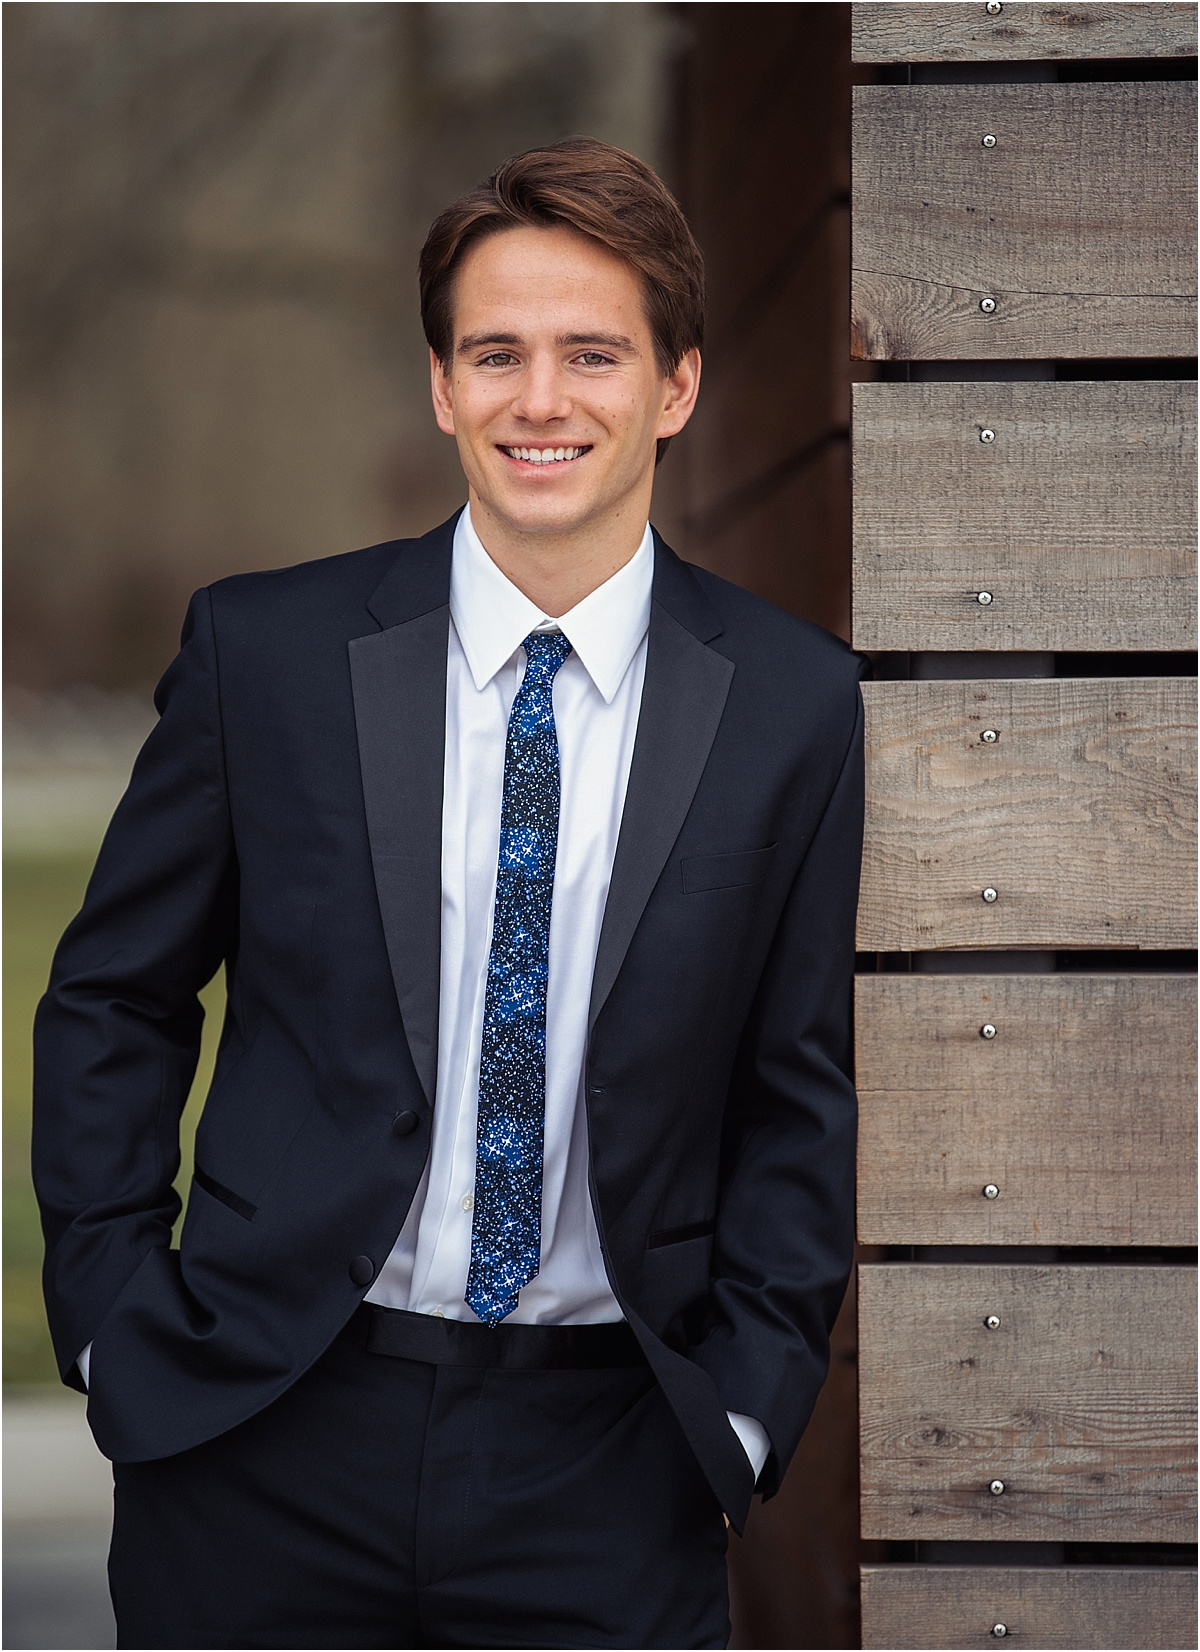 Peterson_college-graduation-beach-portraits-bellevue.jpg